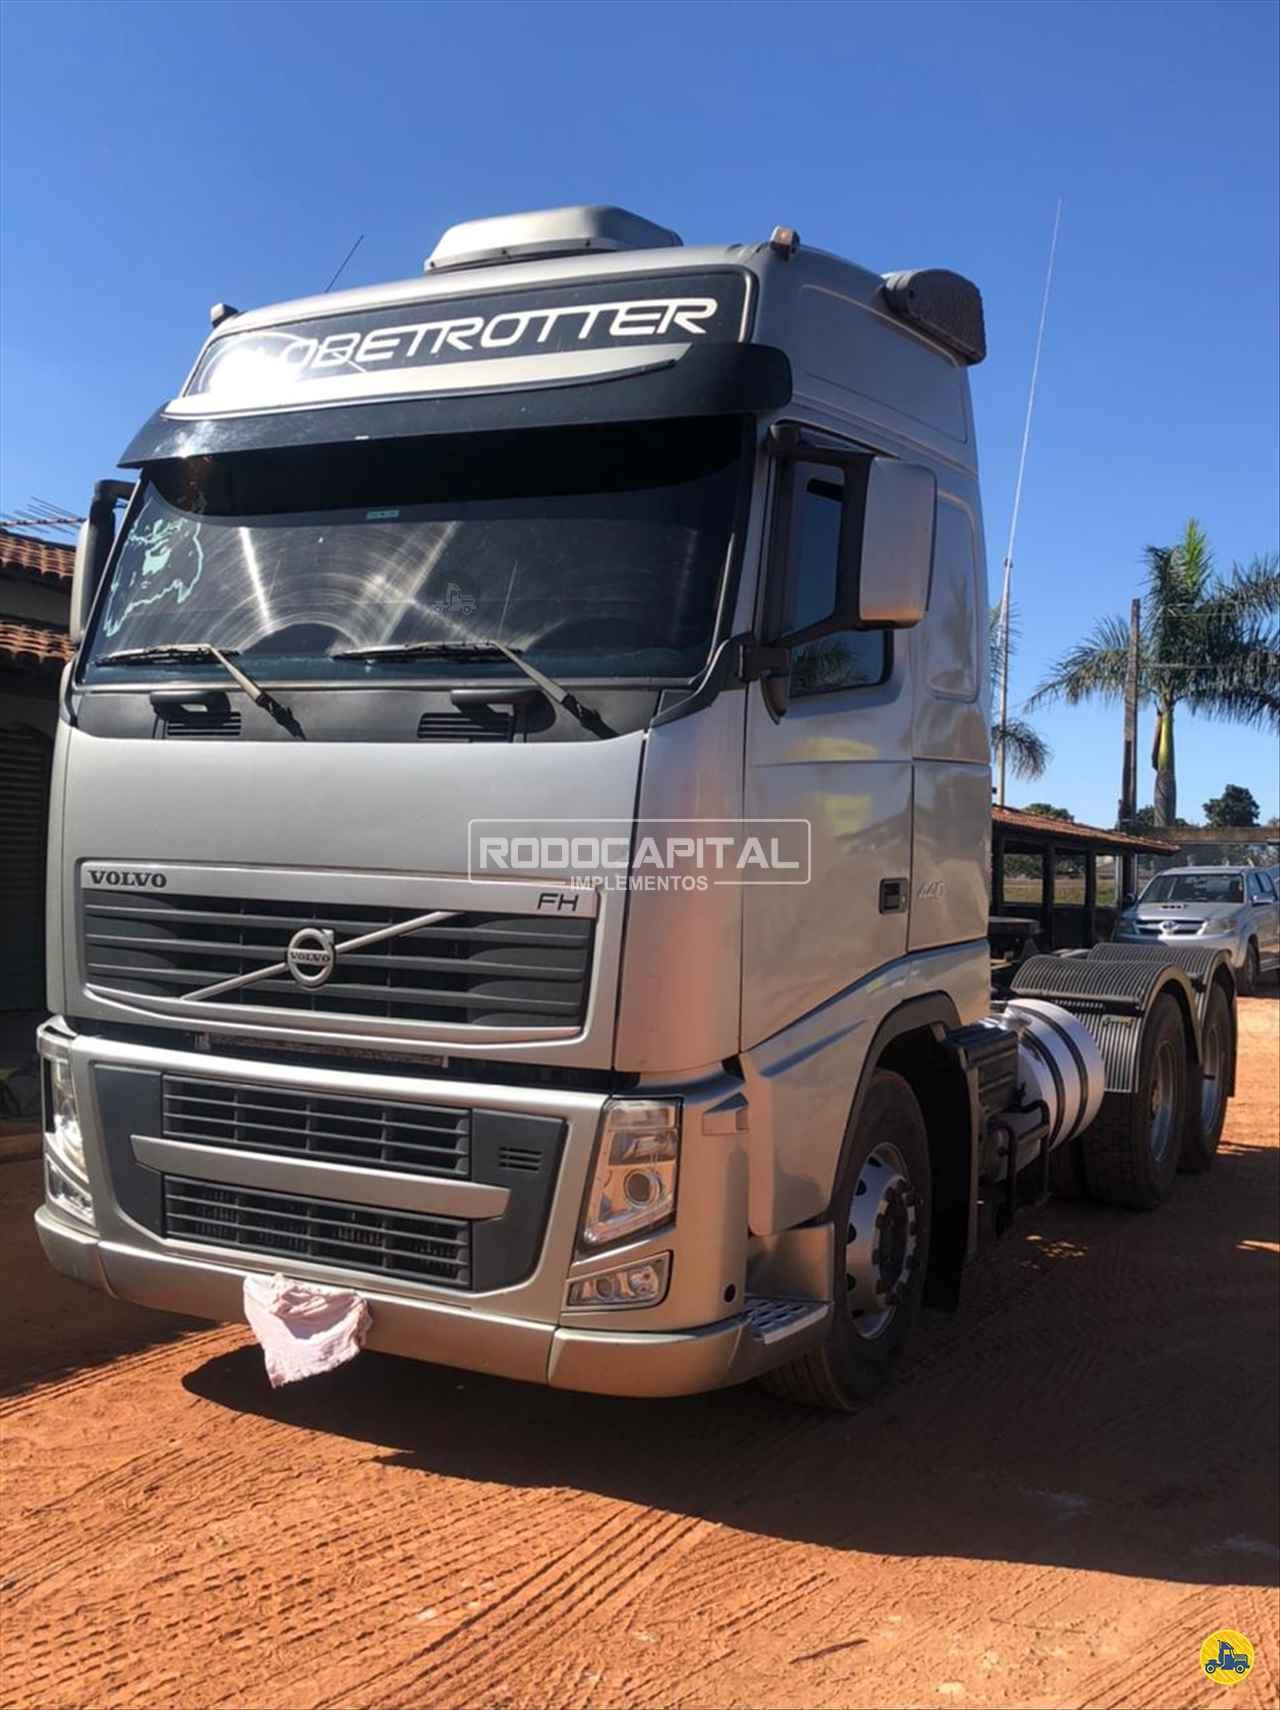 CAMINHAO VOLVO VOLVO FH 440 Cavalo Mecânico Truck 6x2 RODOCAPITAL - TRUCKVAN BRASILIA DISTRITO FEDERAL DF